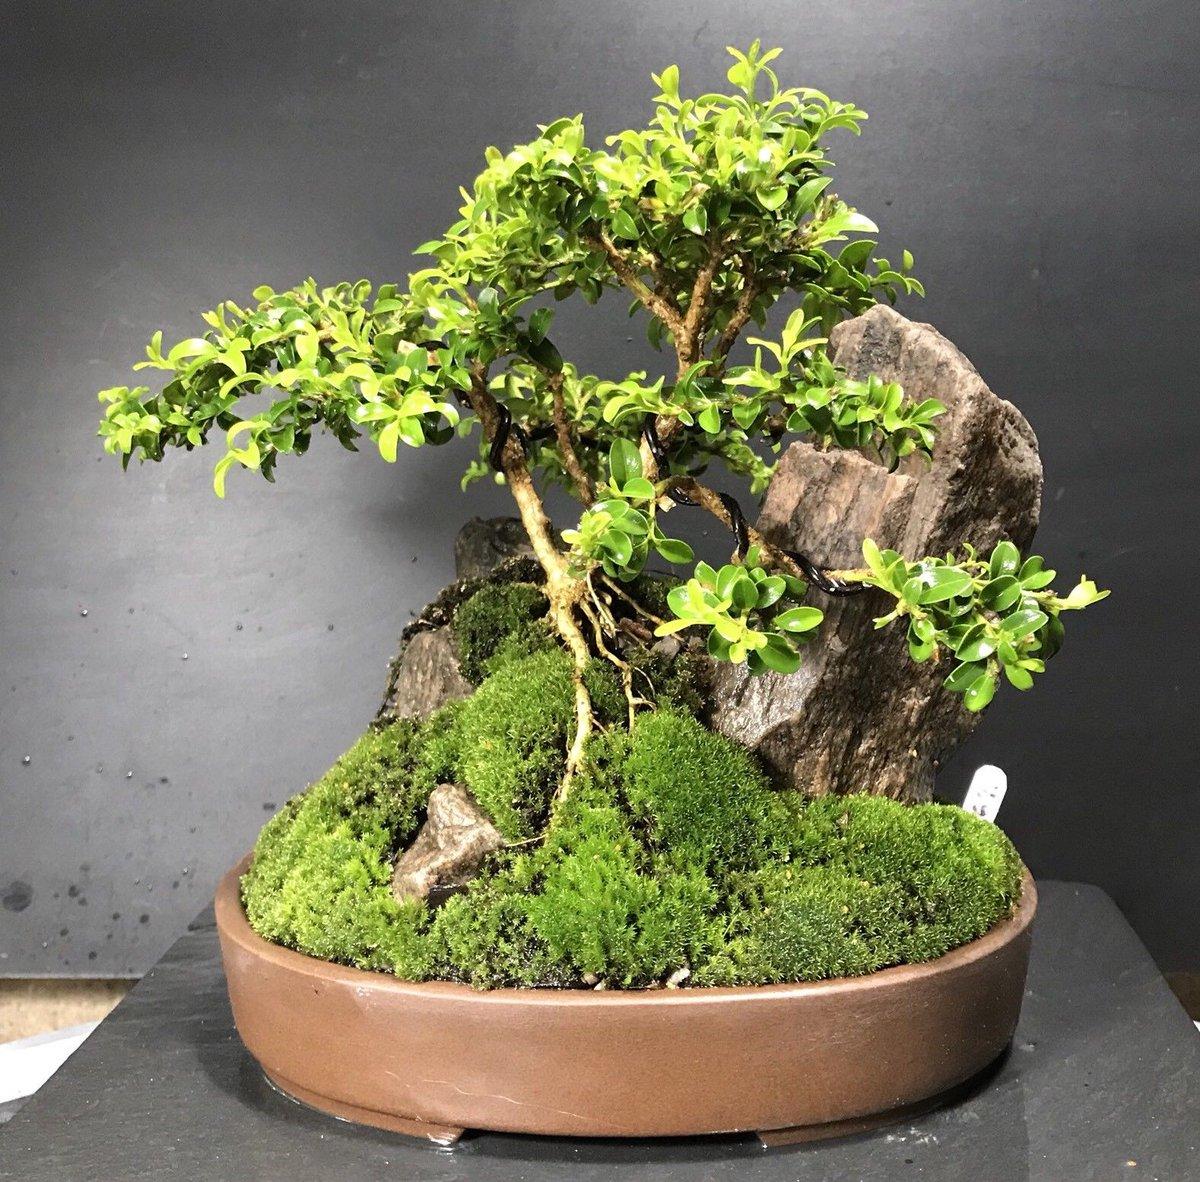 Wikibonsai Com On Twitter Bonsai Kingsville Boxwood Saikei Mini Rocky Landscape 9 Years From Cutting Https T Co Wgmhakrkyd Juniper Juniperusbrevifolia Juniperusphoenicea Https T Co Mhv7yxhw3j